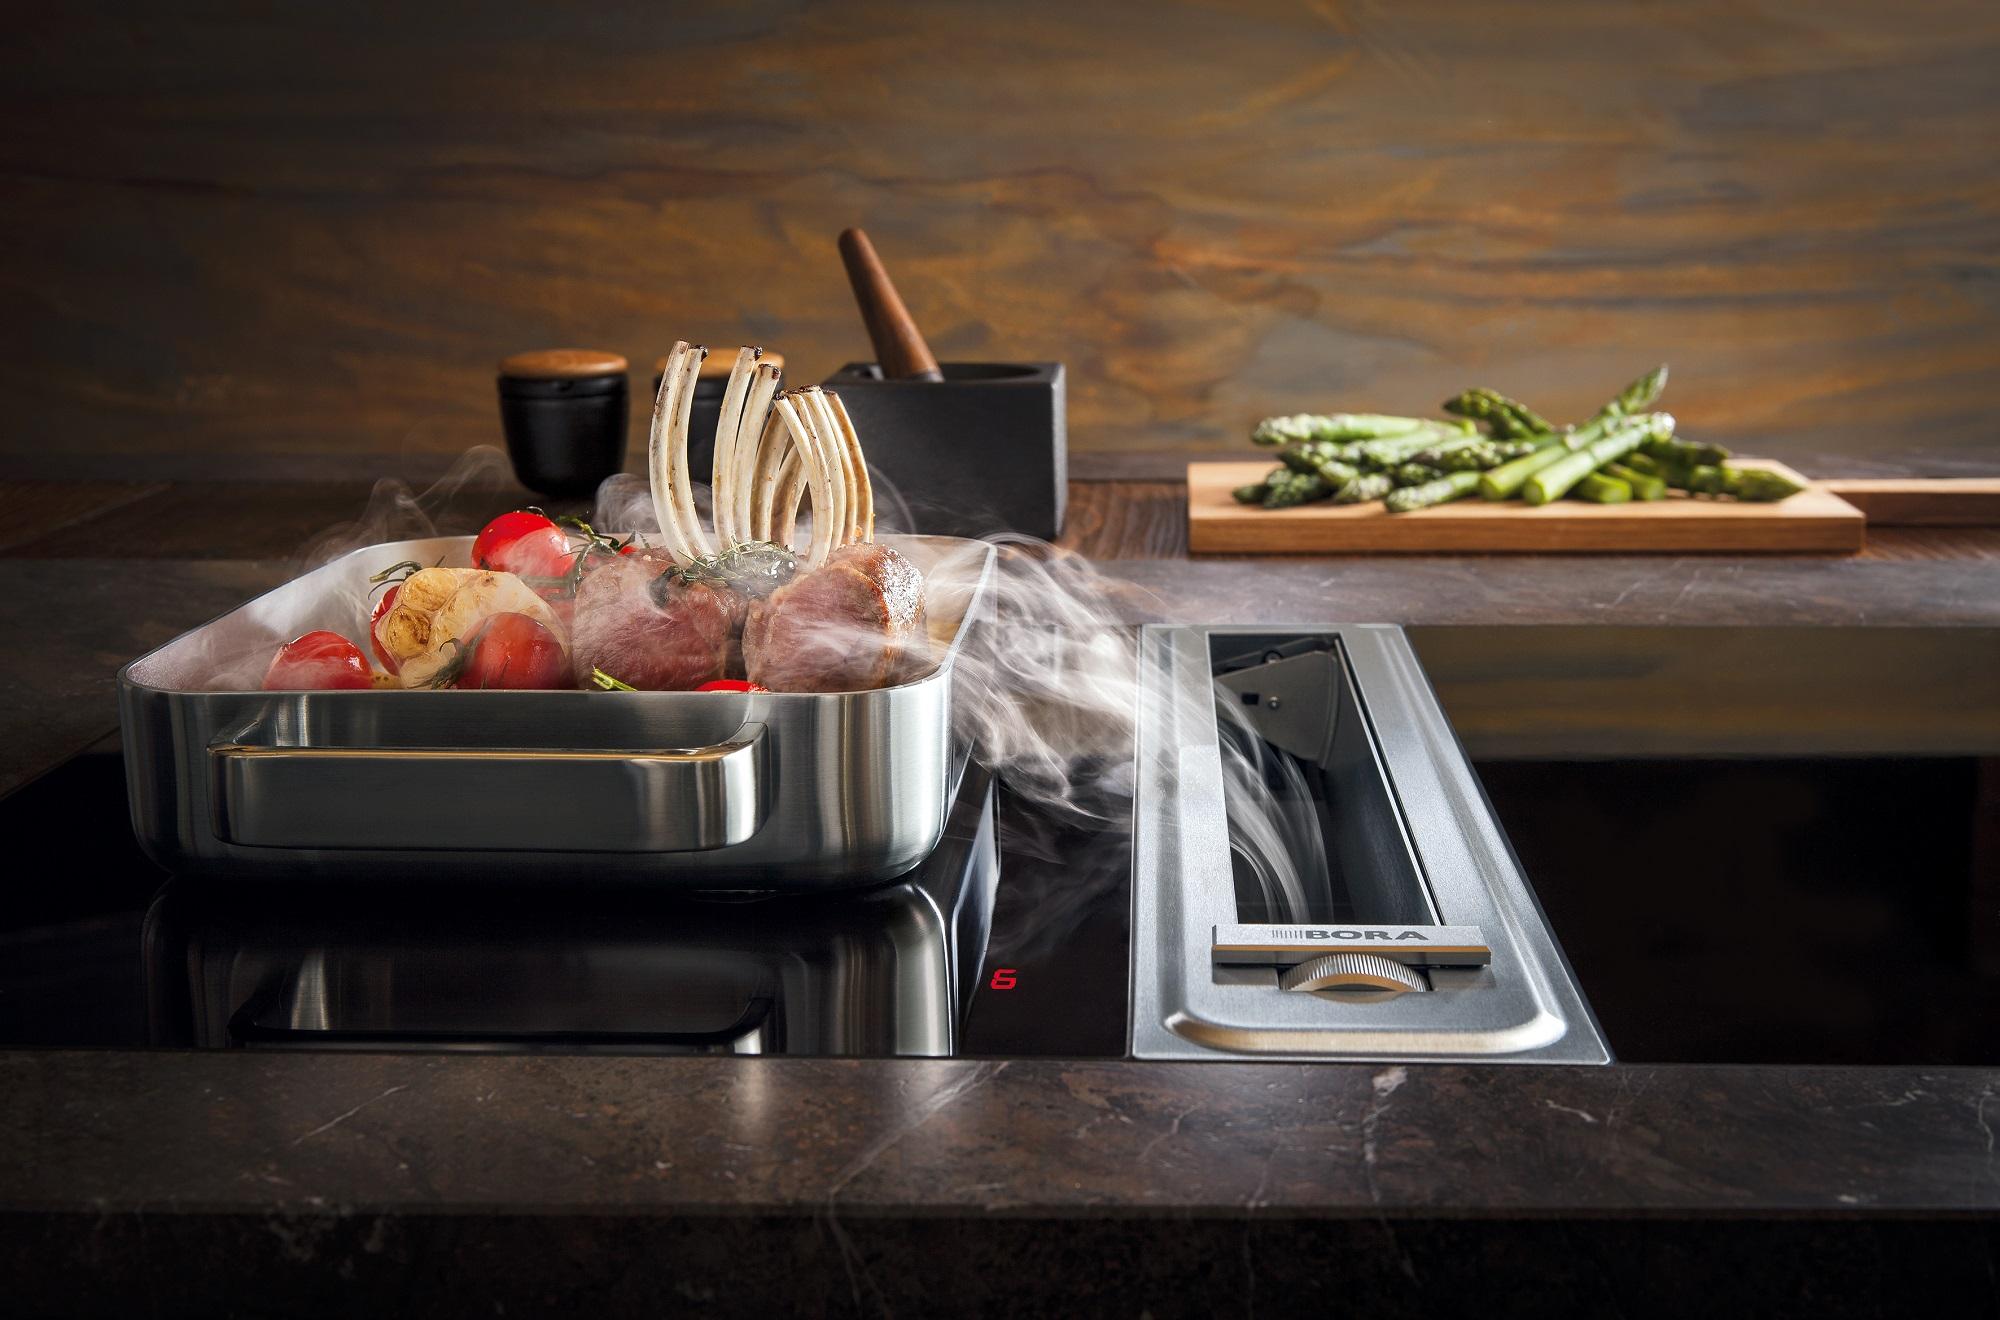 Bora professional: kochen auf höchstem niveau area30 u2013 design